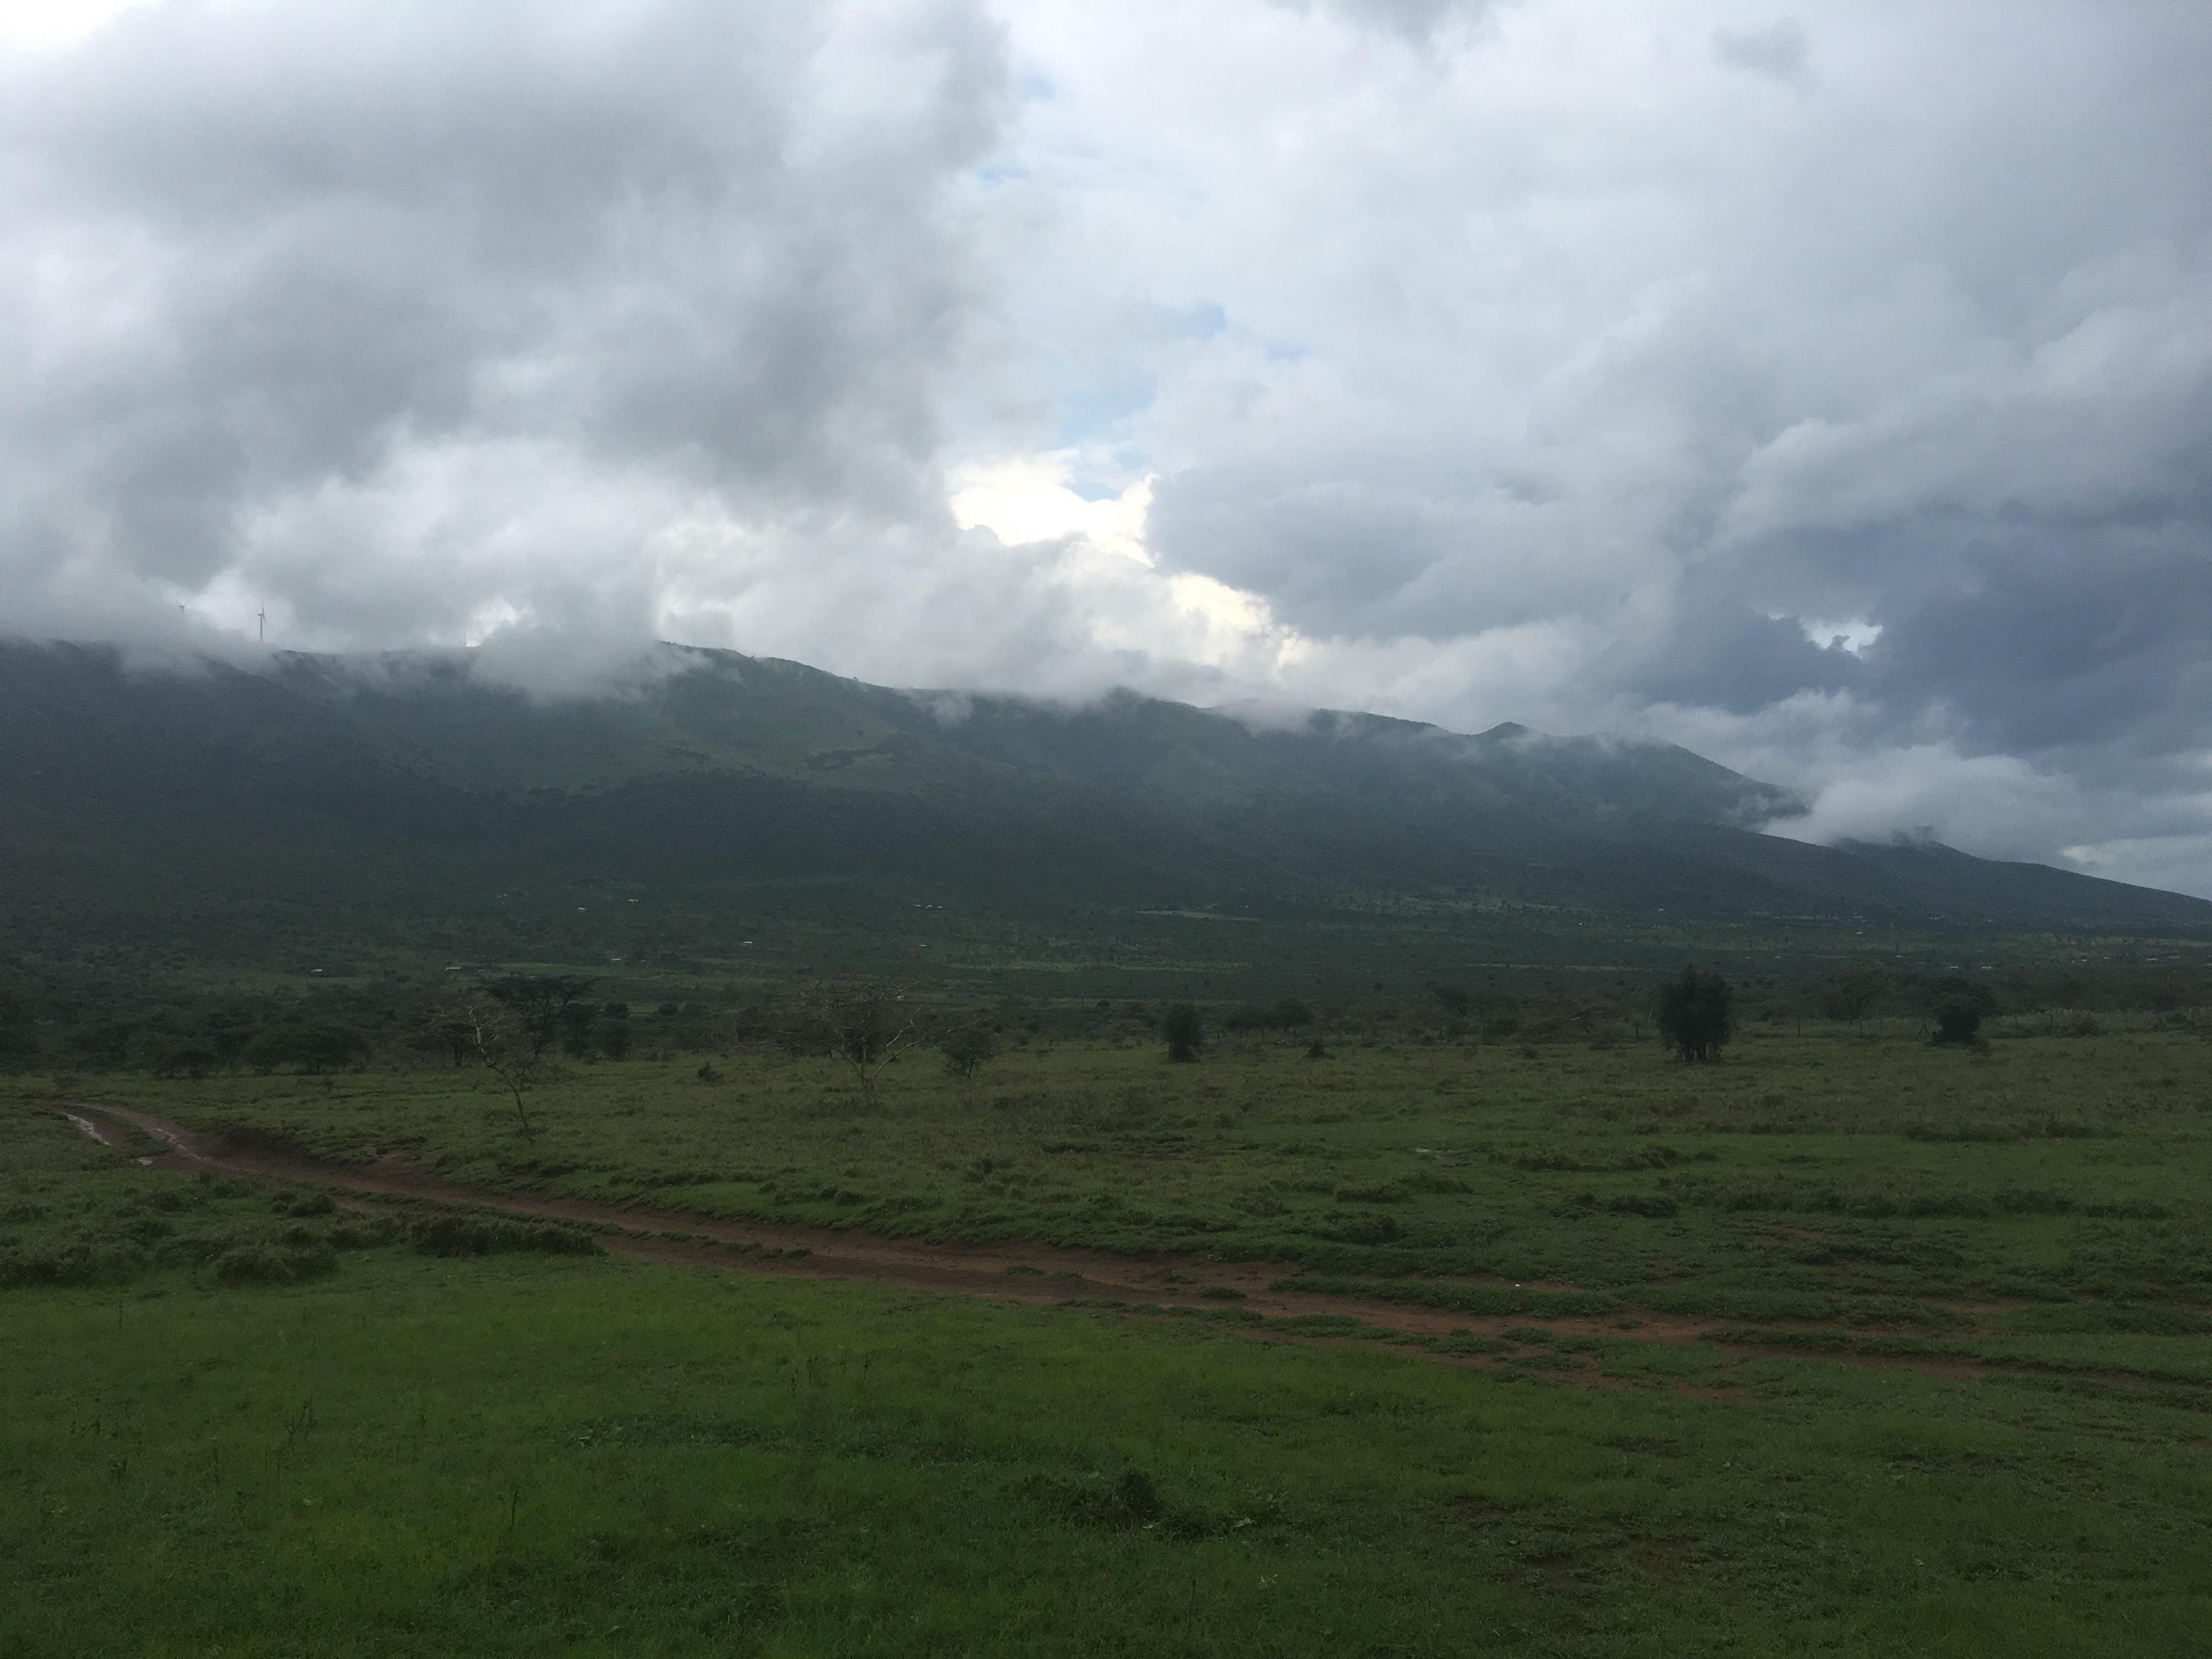 Kenya rainy weather